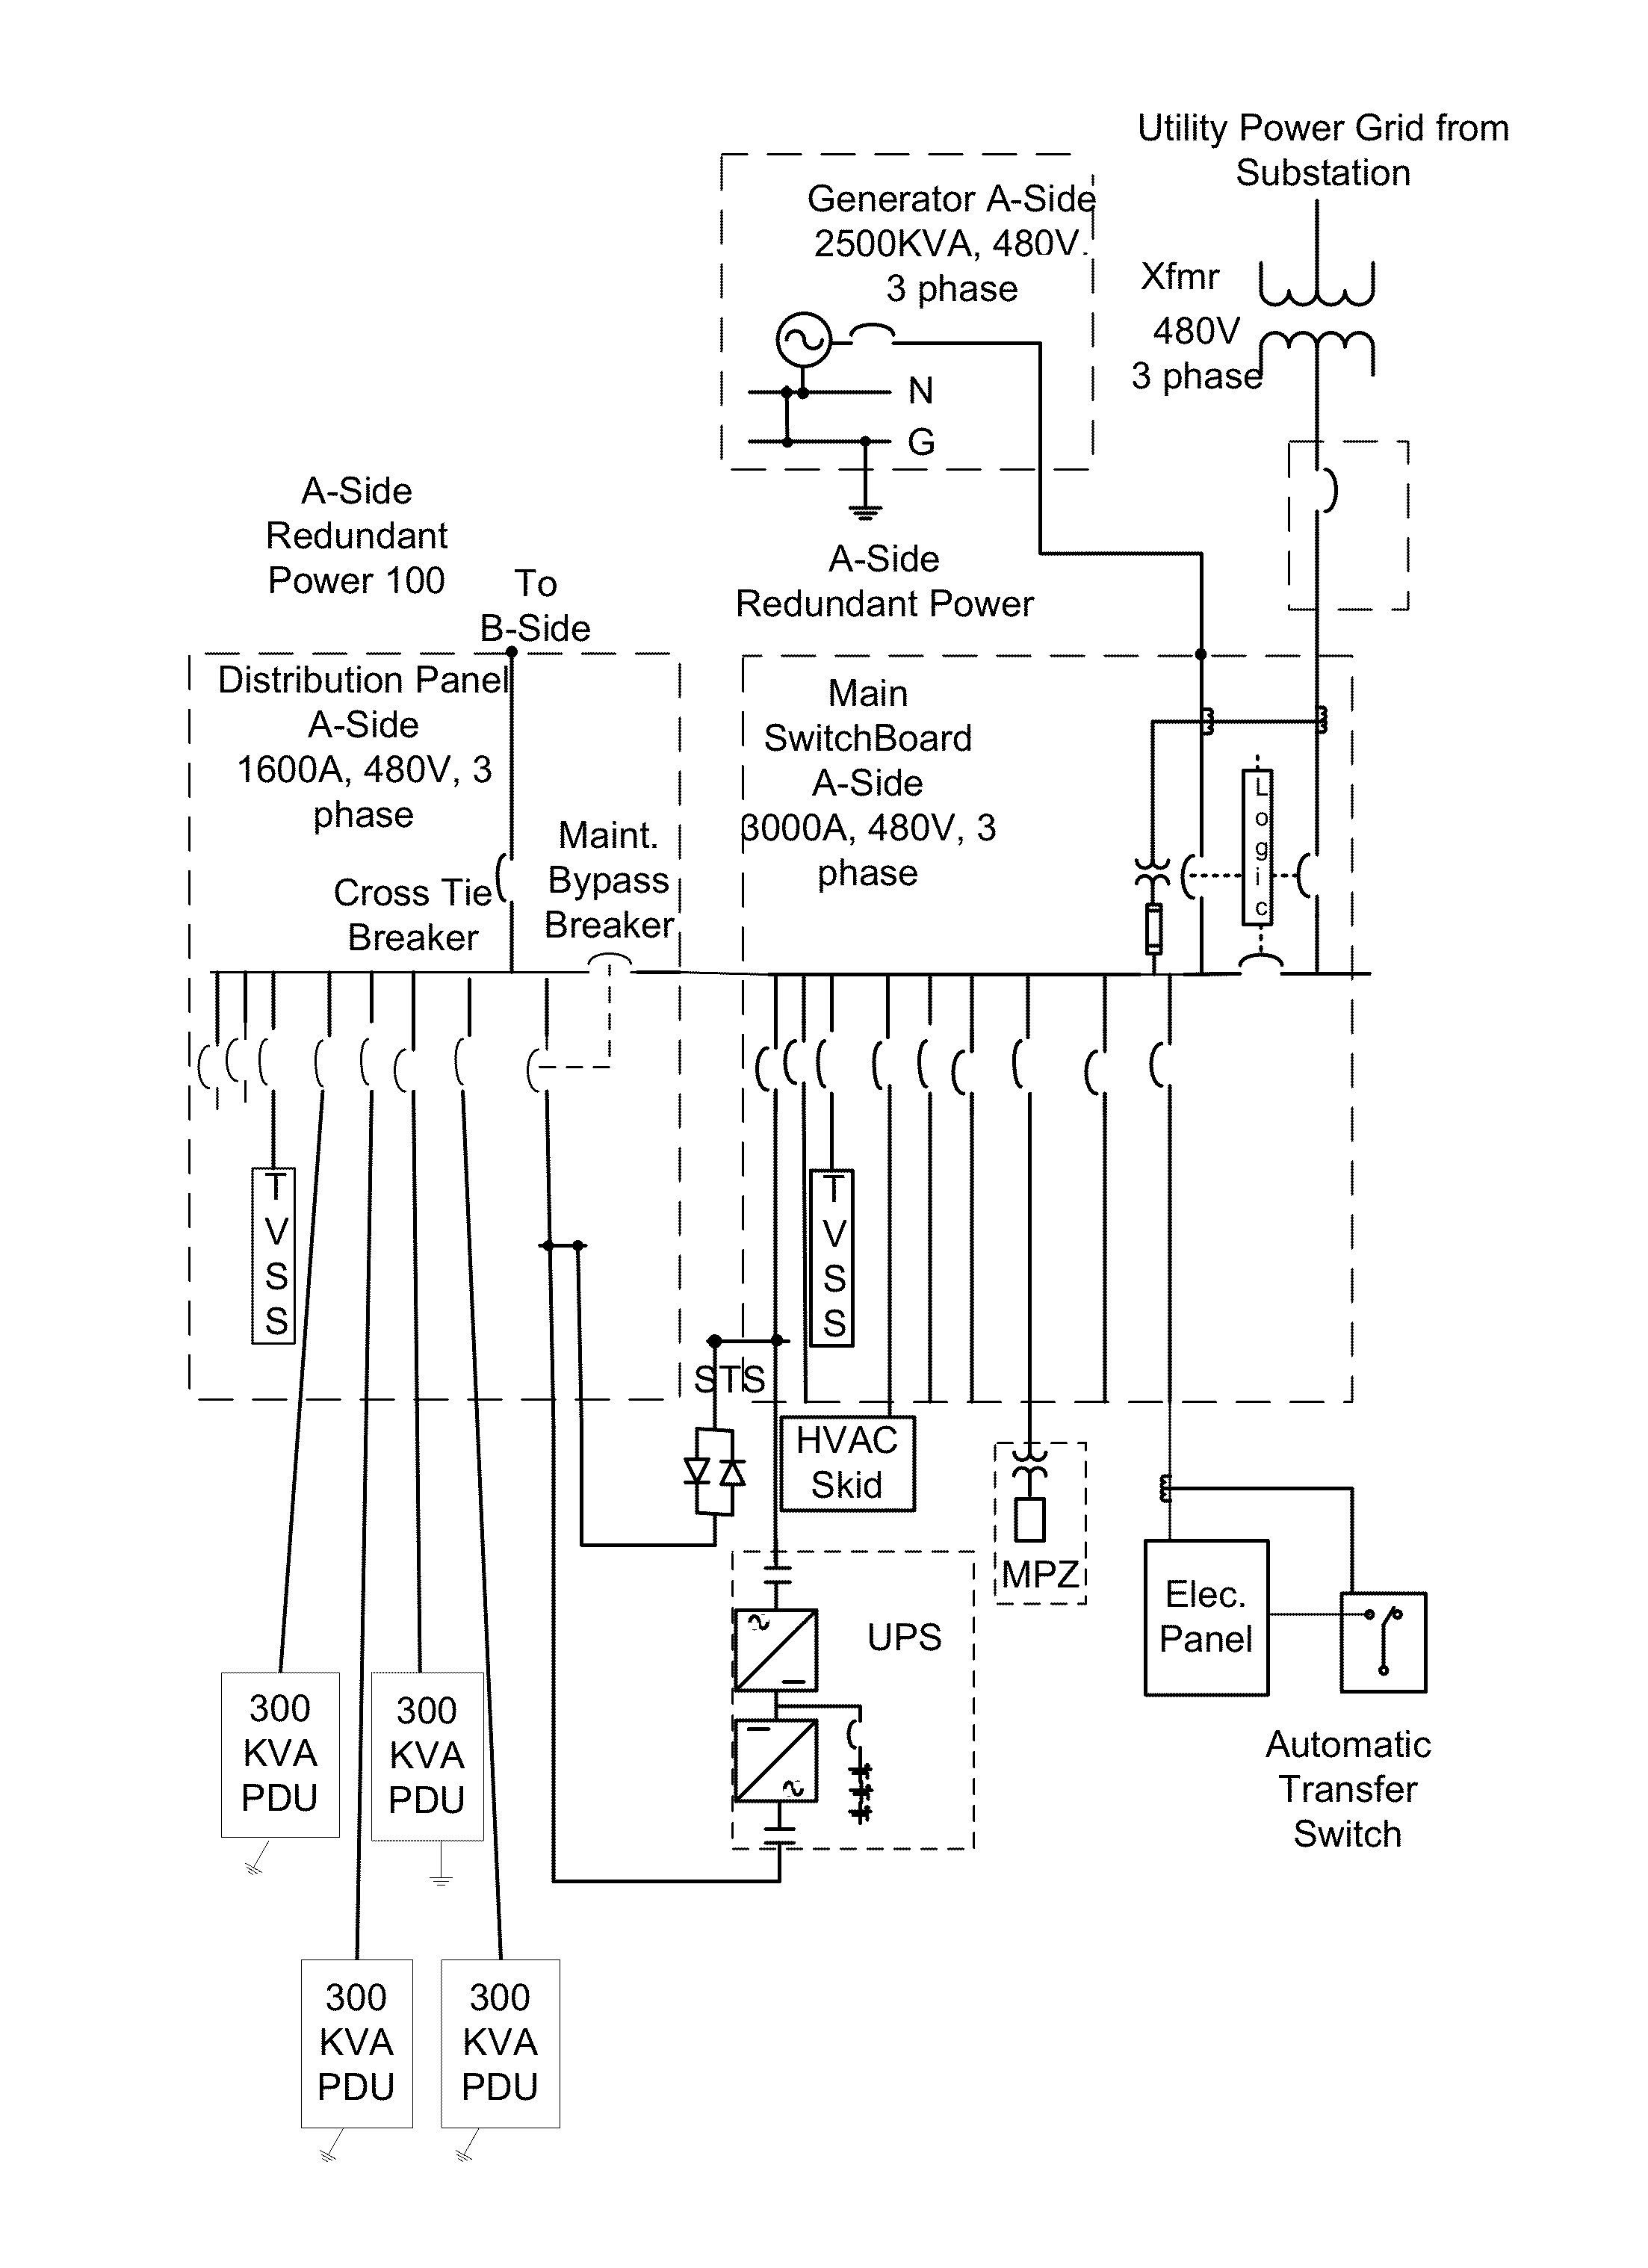 2001 Peterbilt 379 Wiring Diagram Cooling Fan